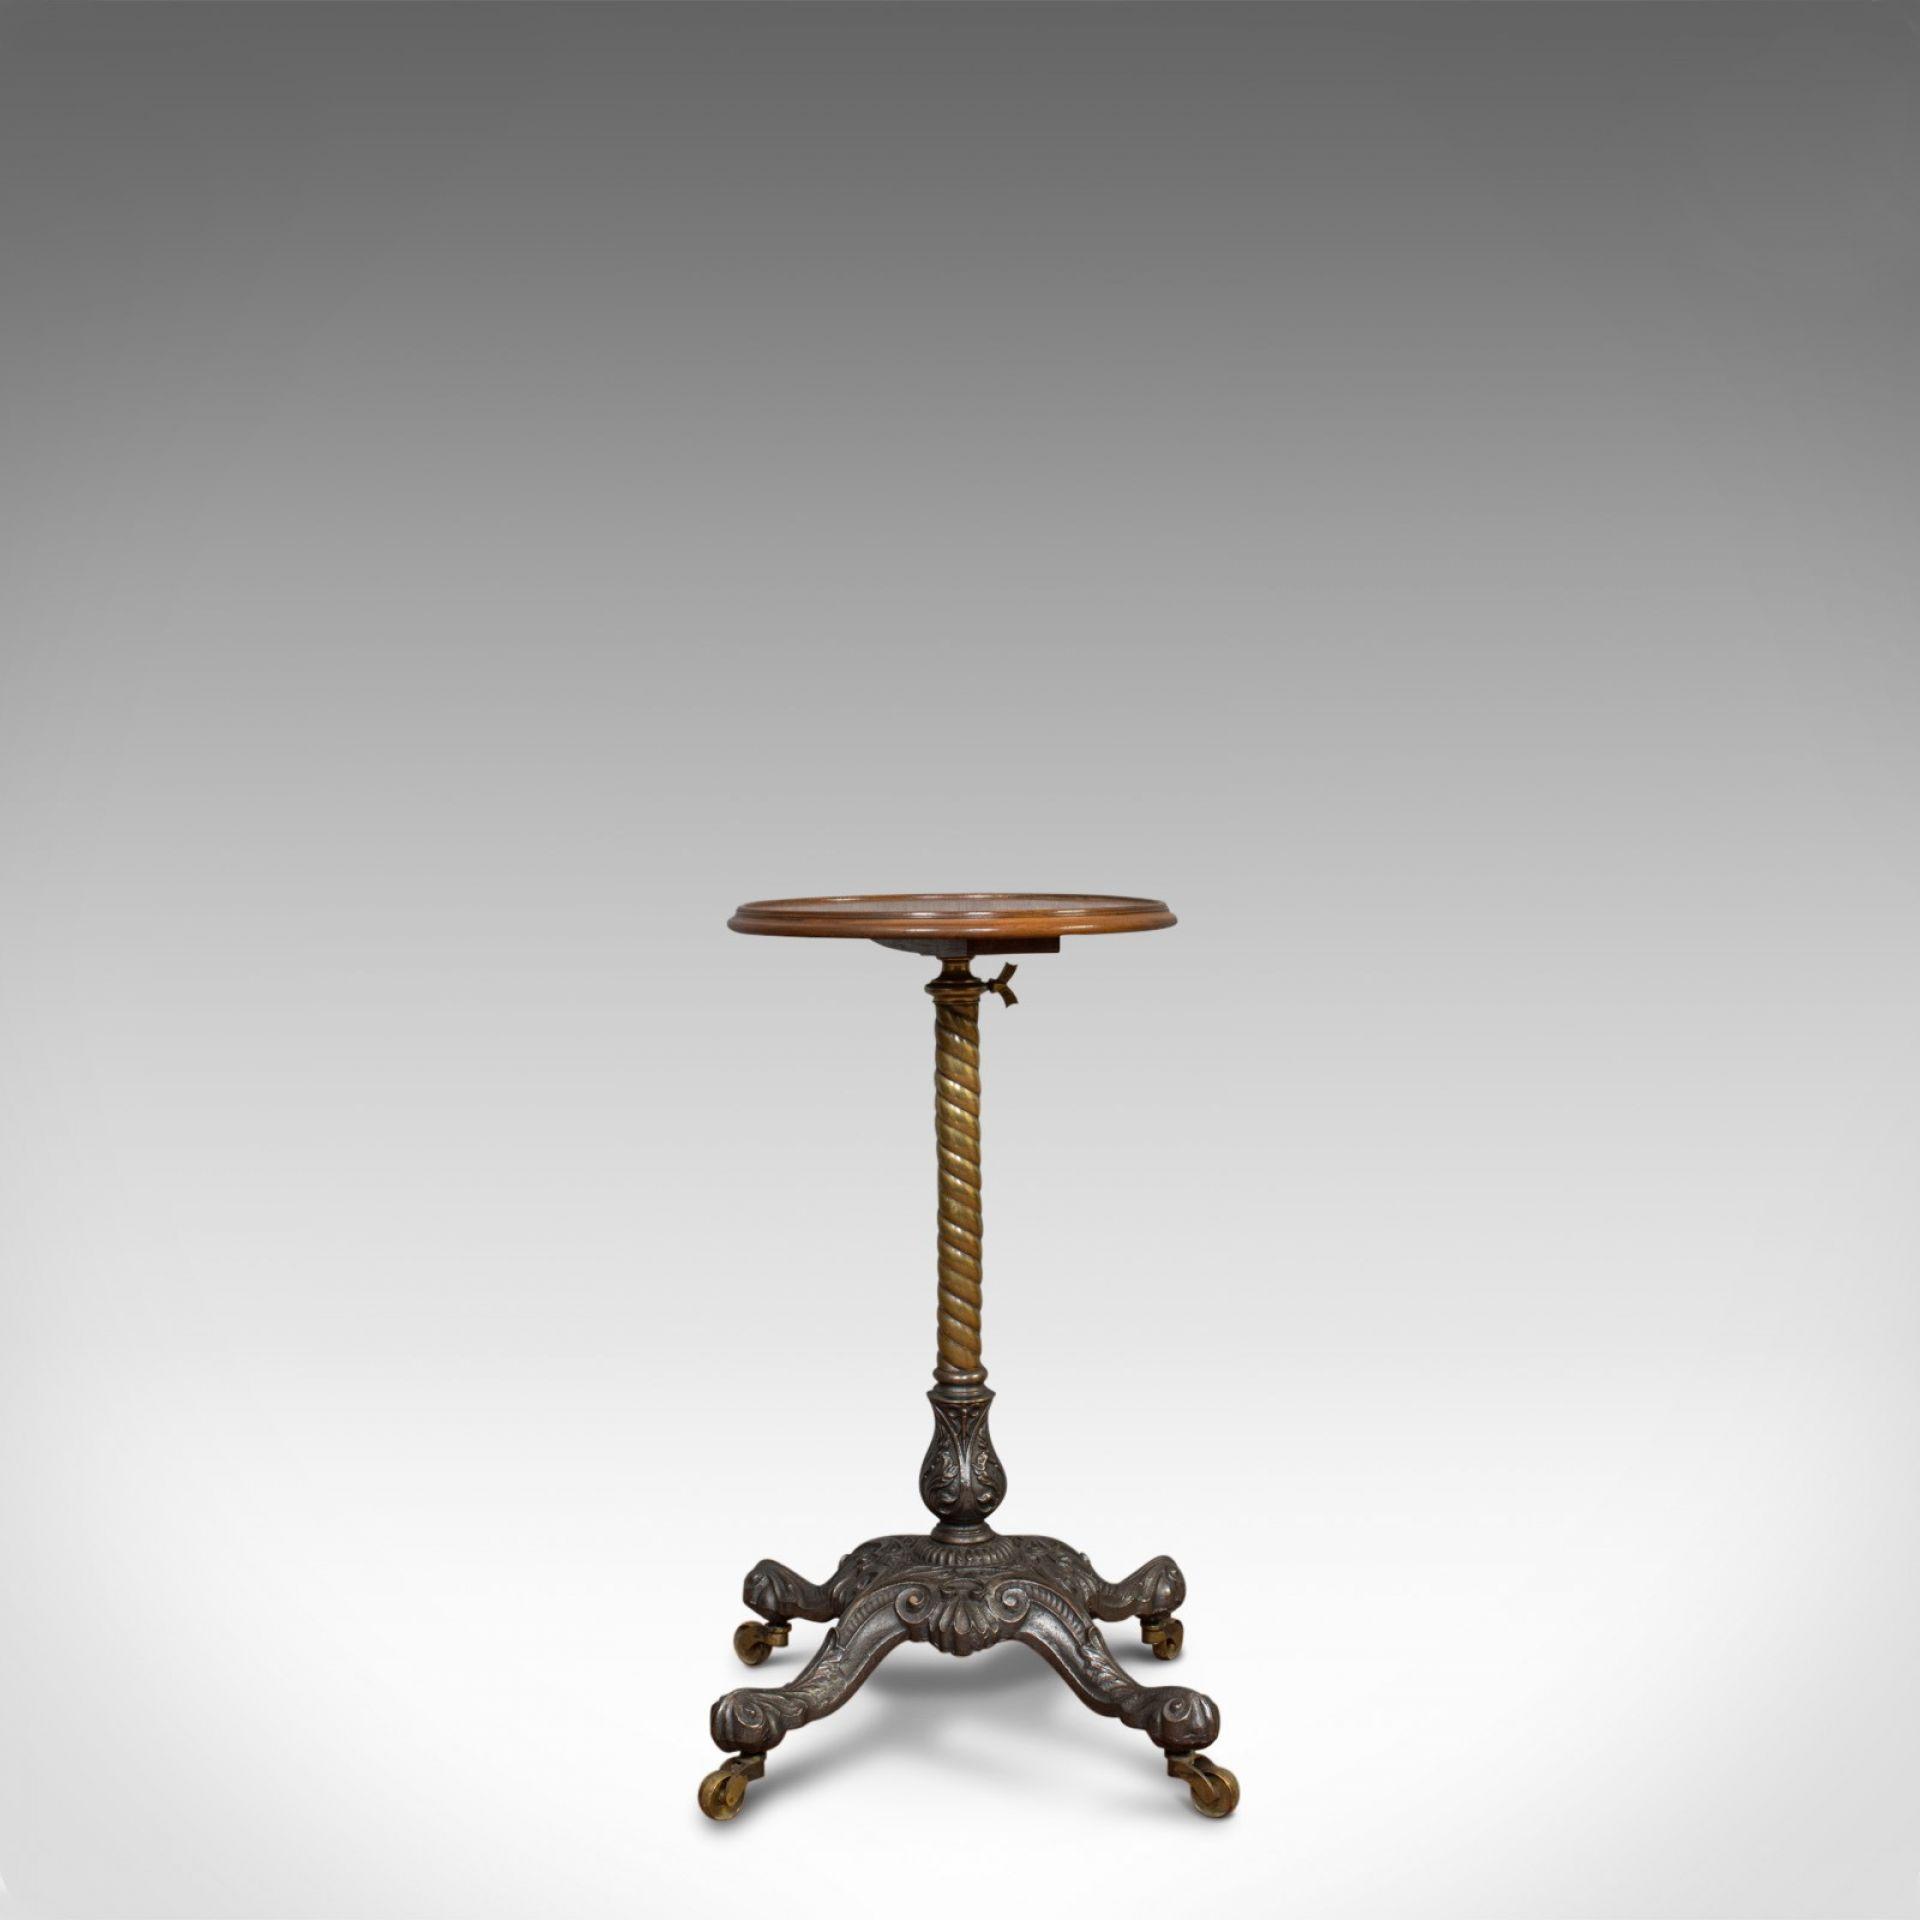 Antique Adjustable Wine Table, English, Mahogany, Cast Iron, Plant, Jardiniere